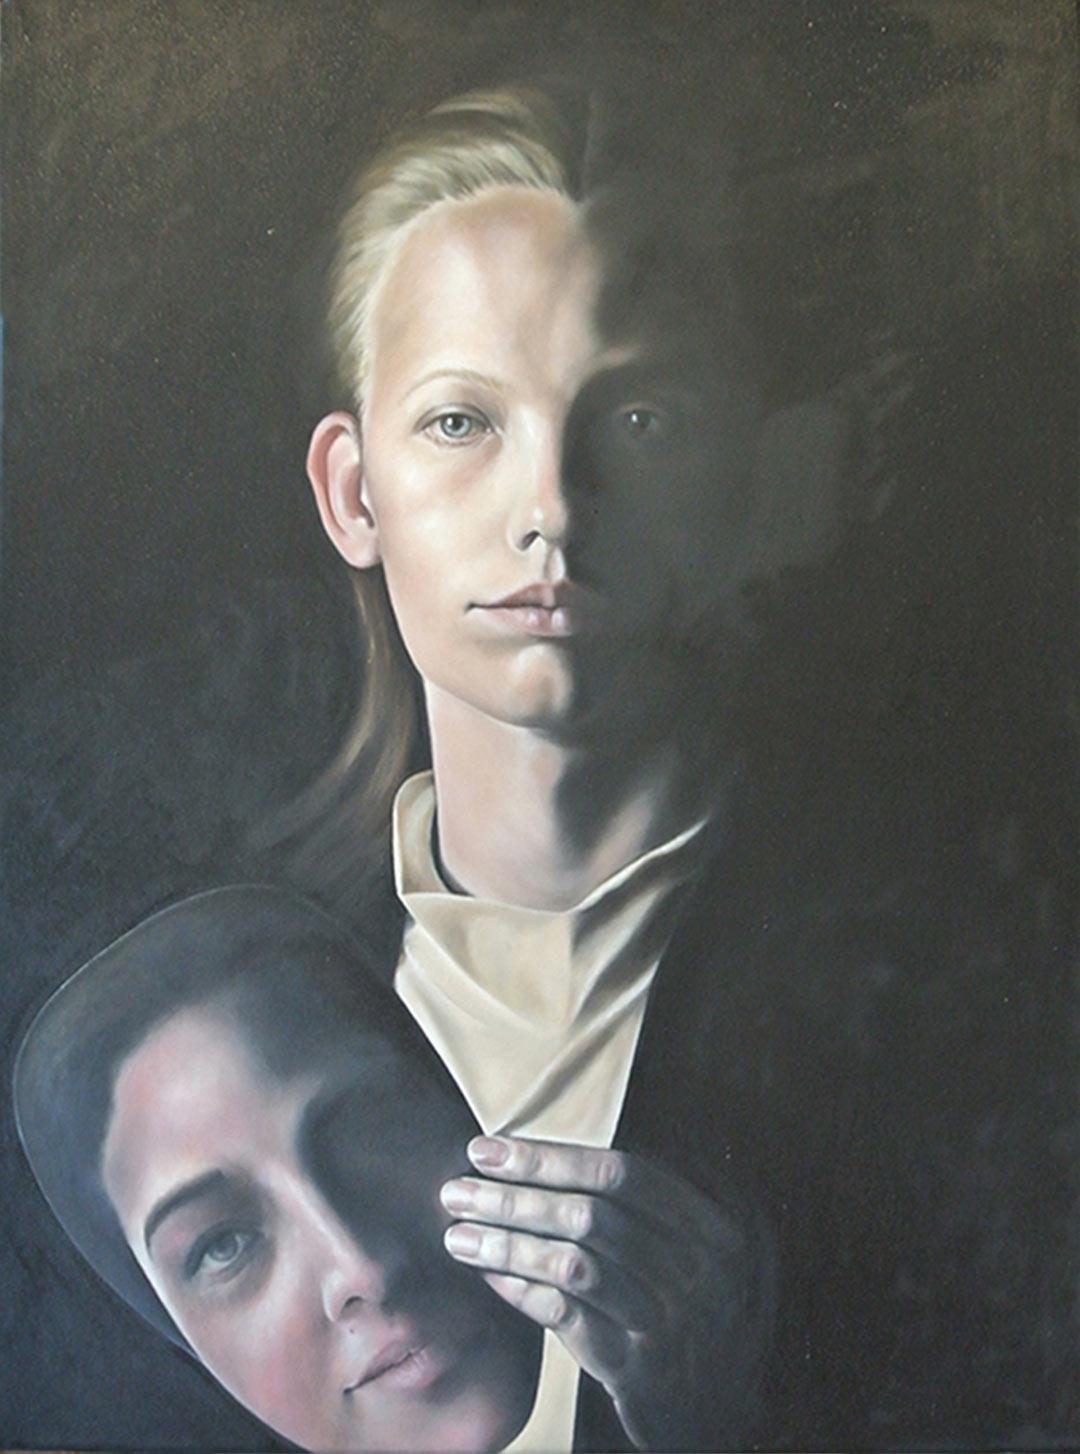 Silke Aurora, bad hair day, oil on canvas, 60 x 60 cm